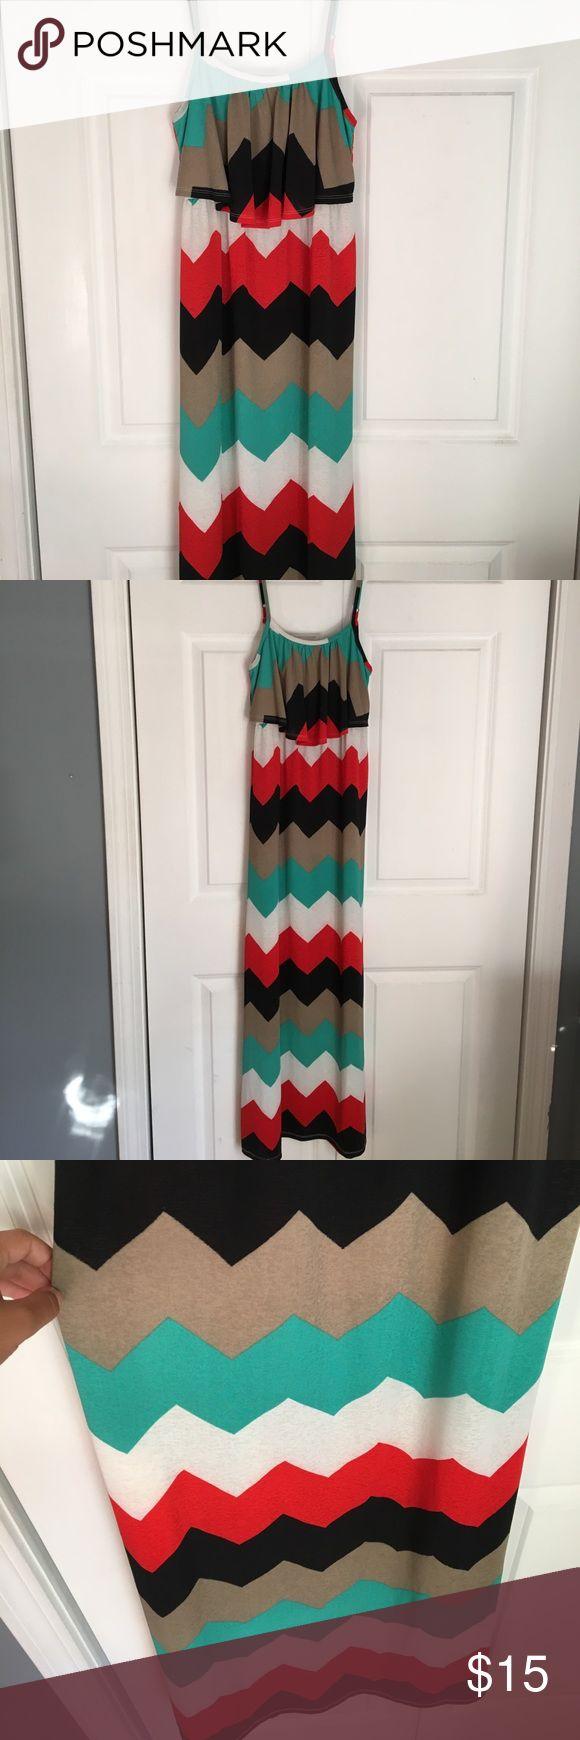 Chevron Maxi Dress Beautiful Chevron Maxi Dress. Good shape! Has adjustable straps. Dresses Maxi